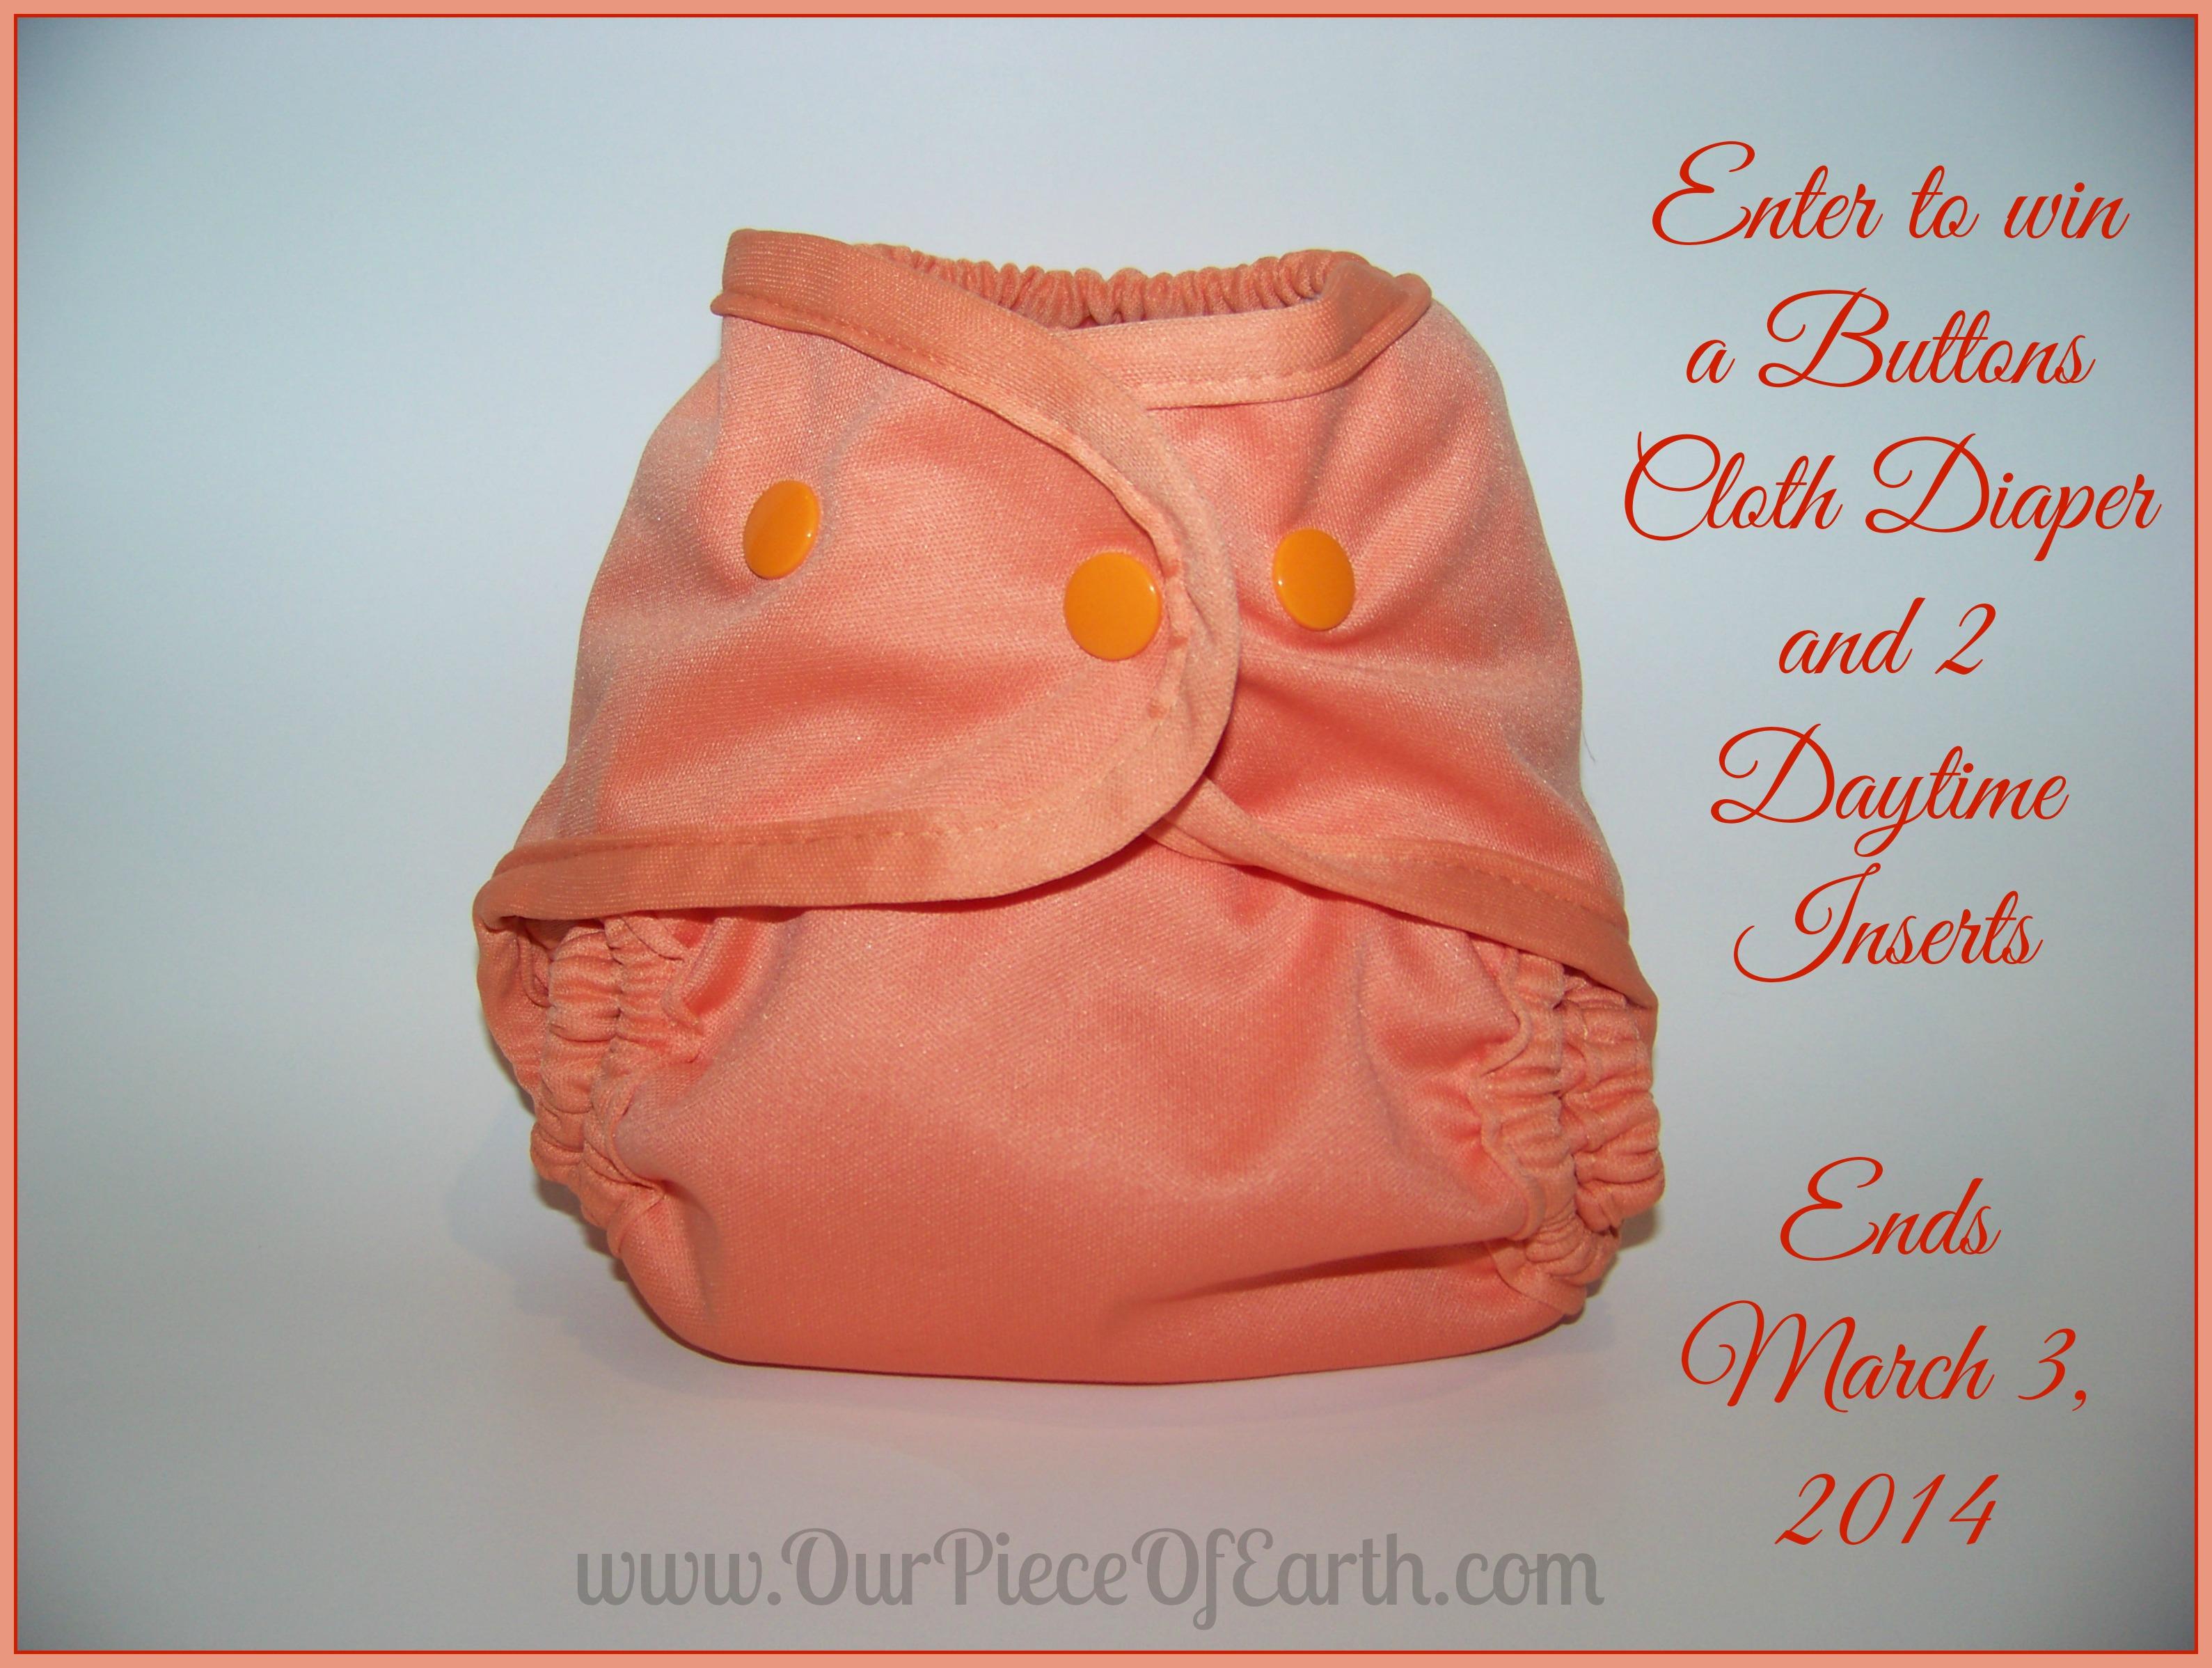 Buttons cloth Diapers, Budget cloth diaper